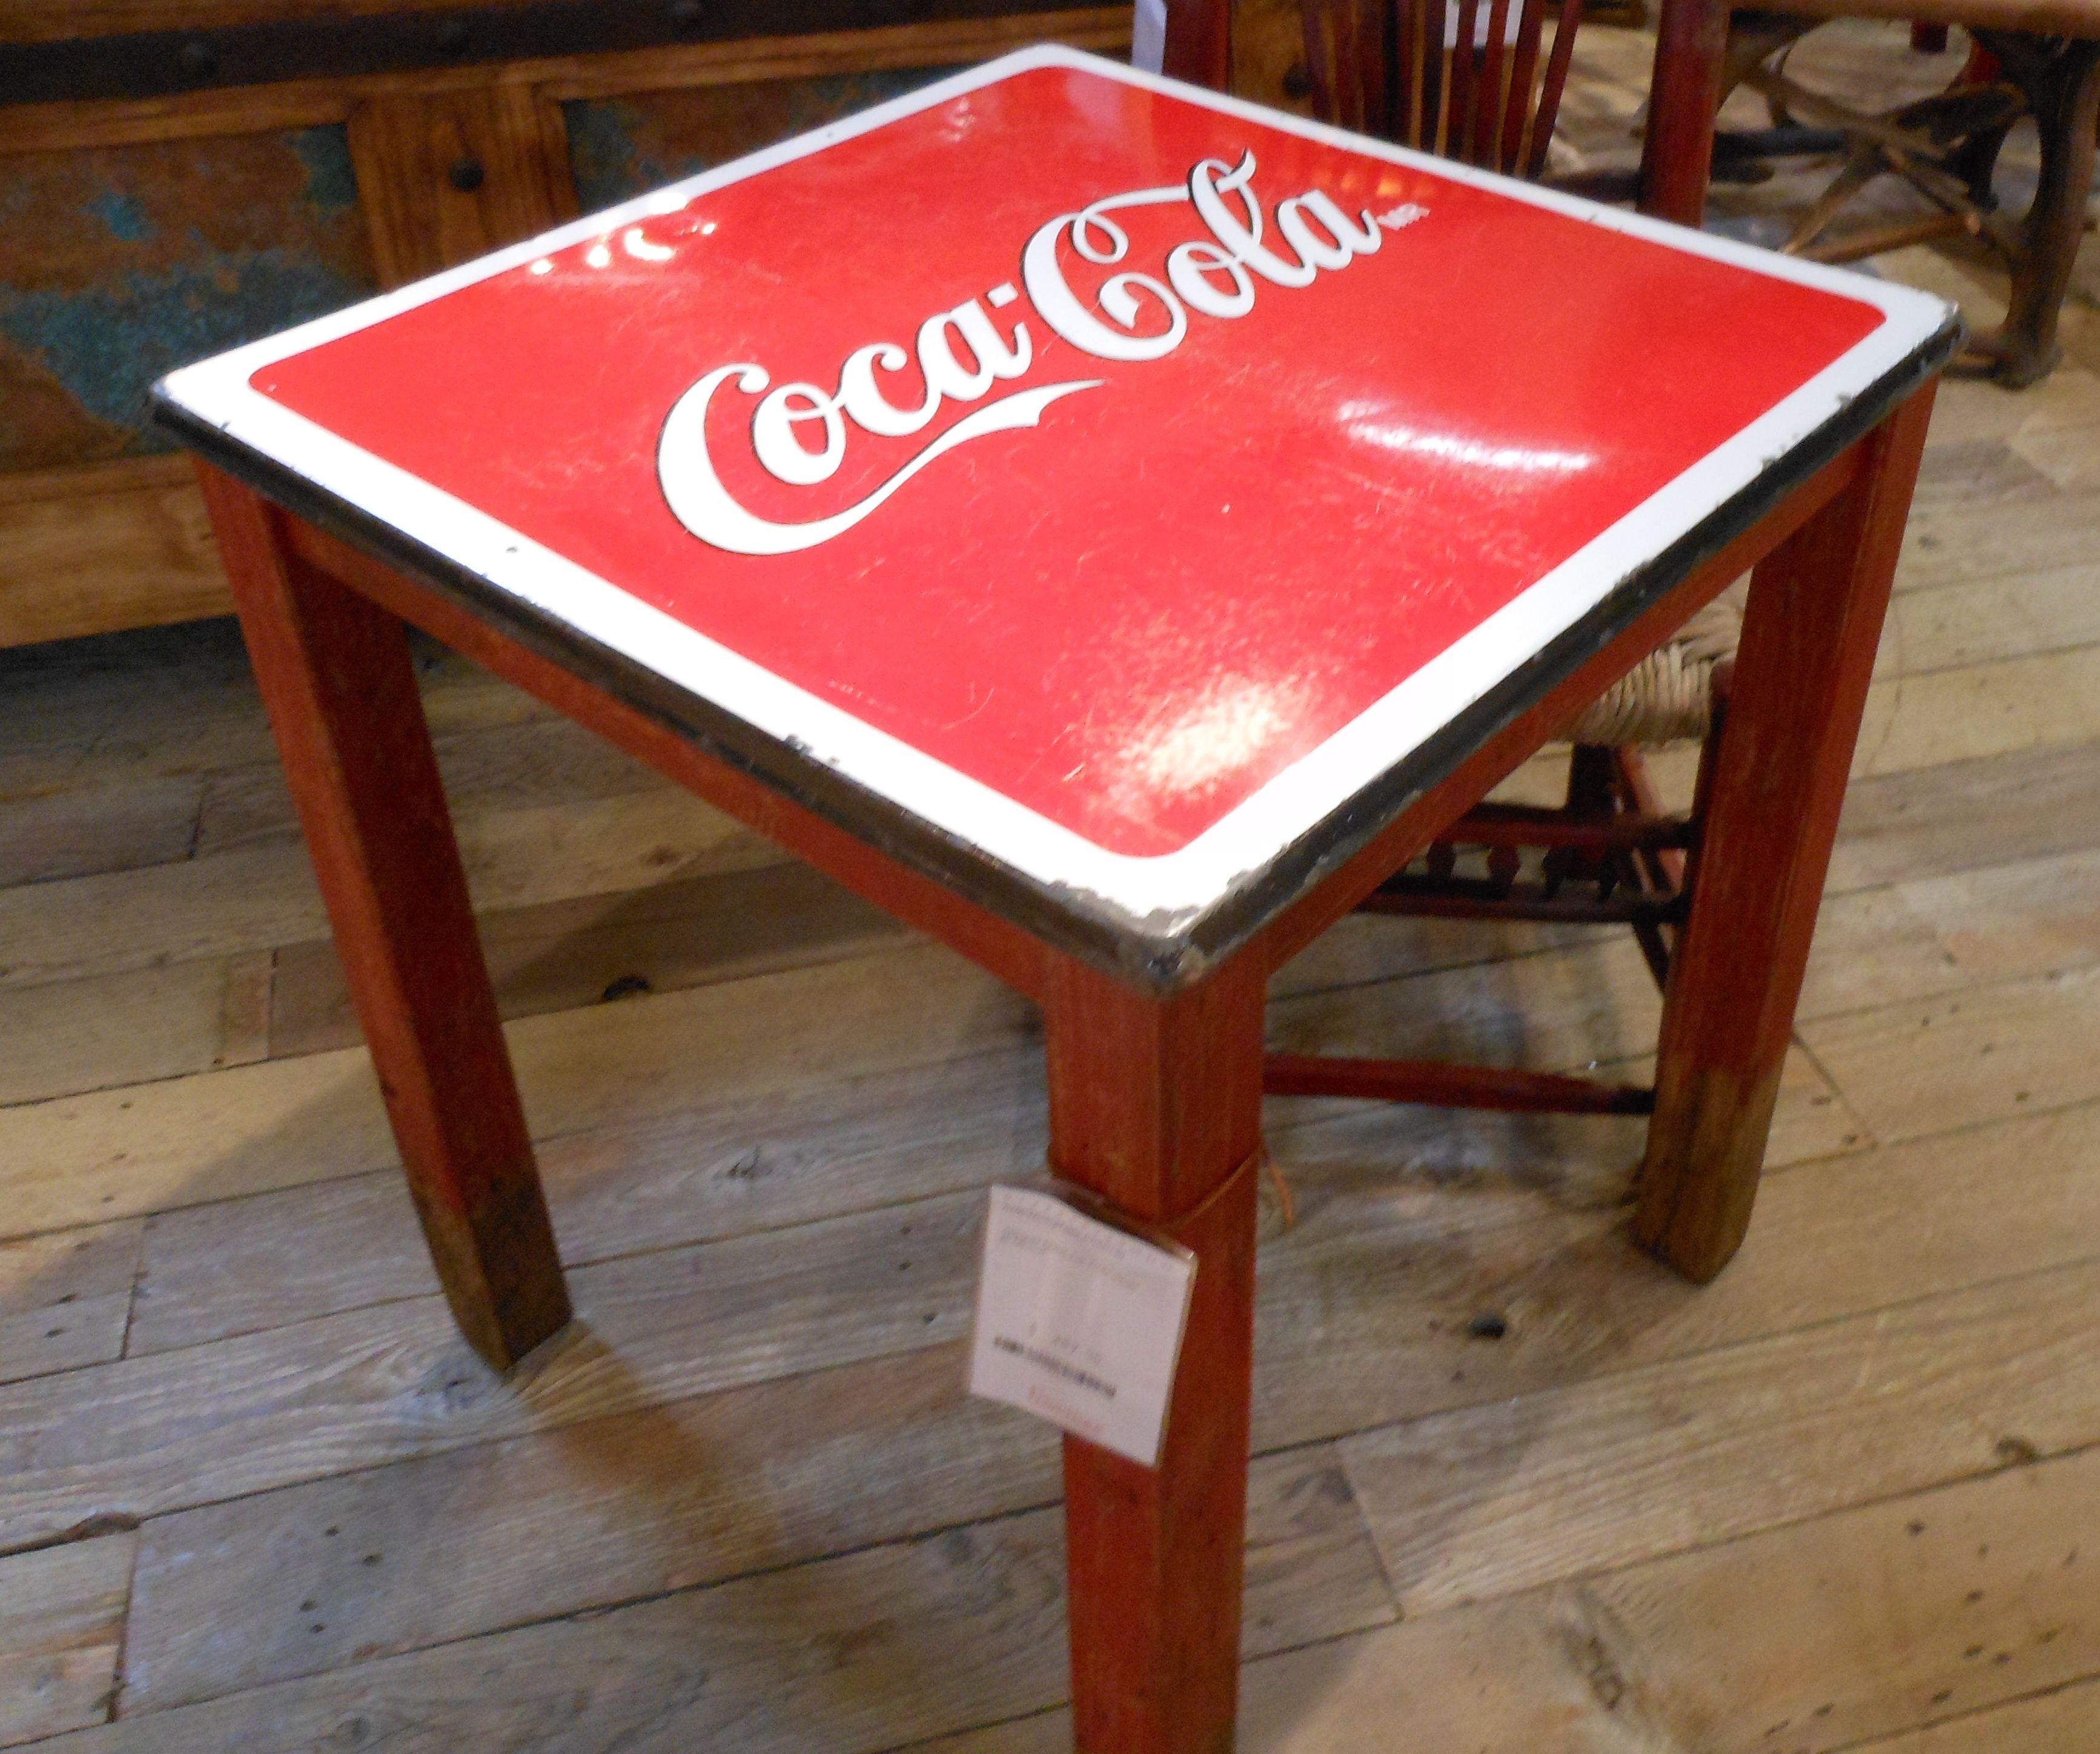 Cute little Coca Cola table from Mexico home decor